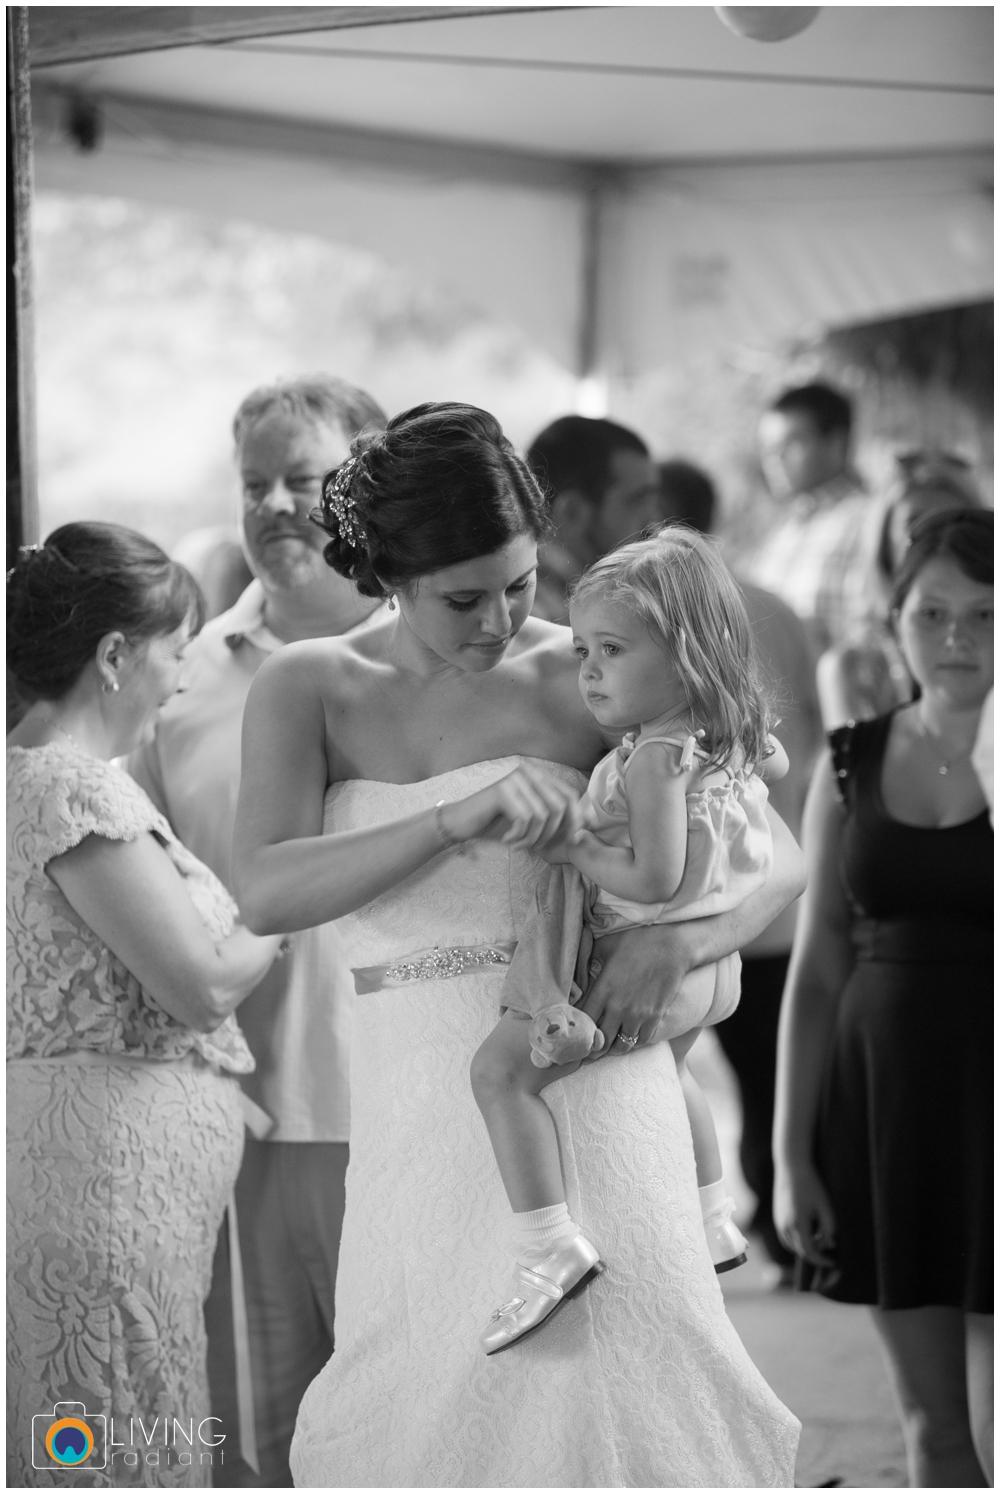 shannon-bill-bowers-wedding-living-radiant-photography-union-mills-homestead_0035.jpg